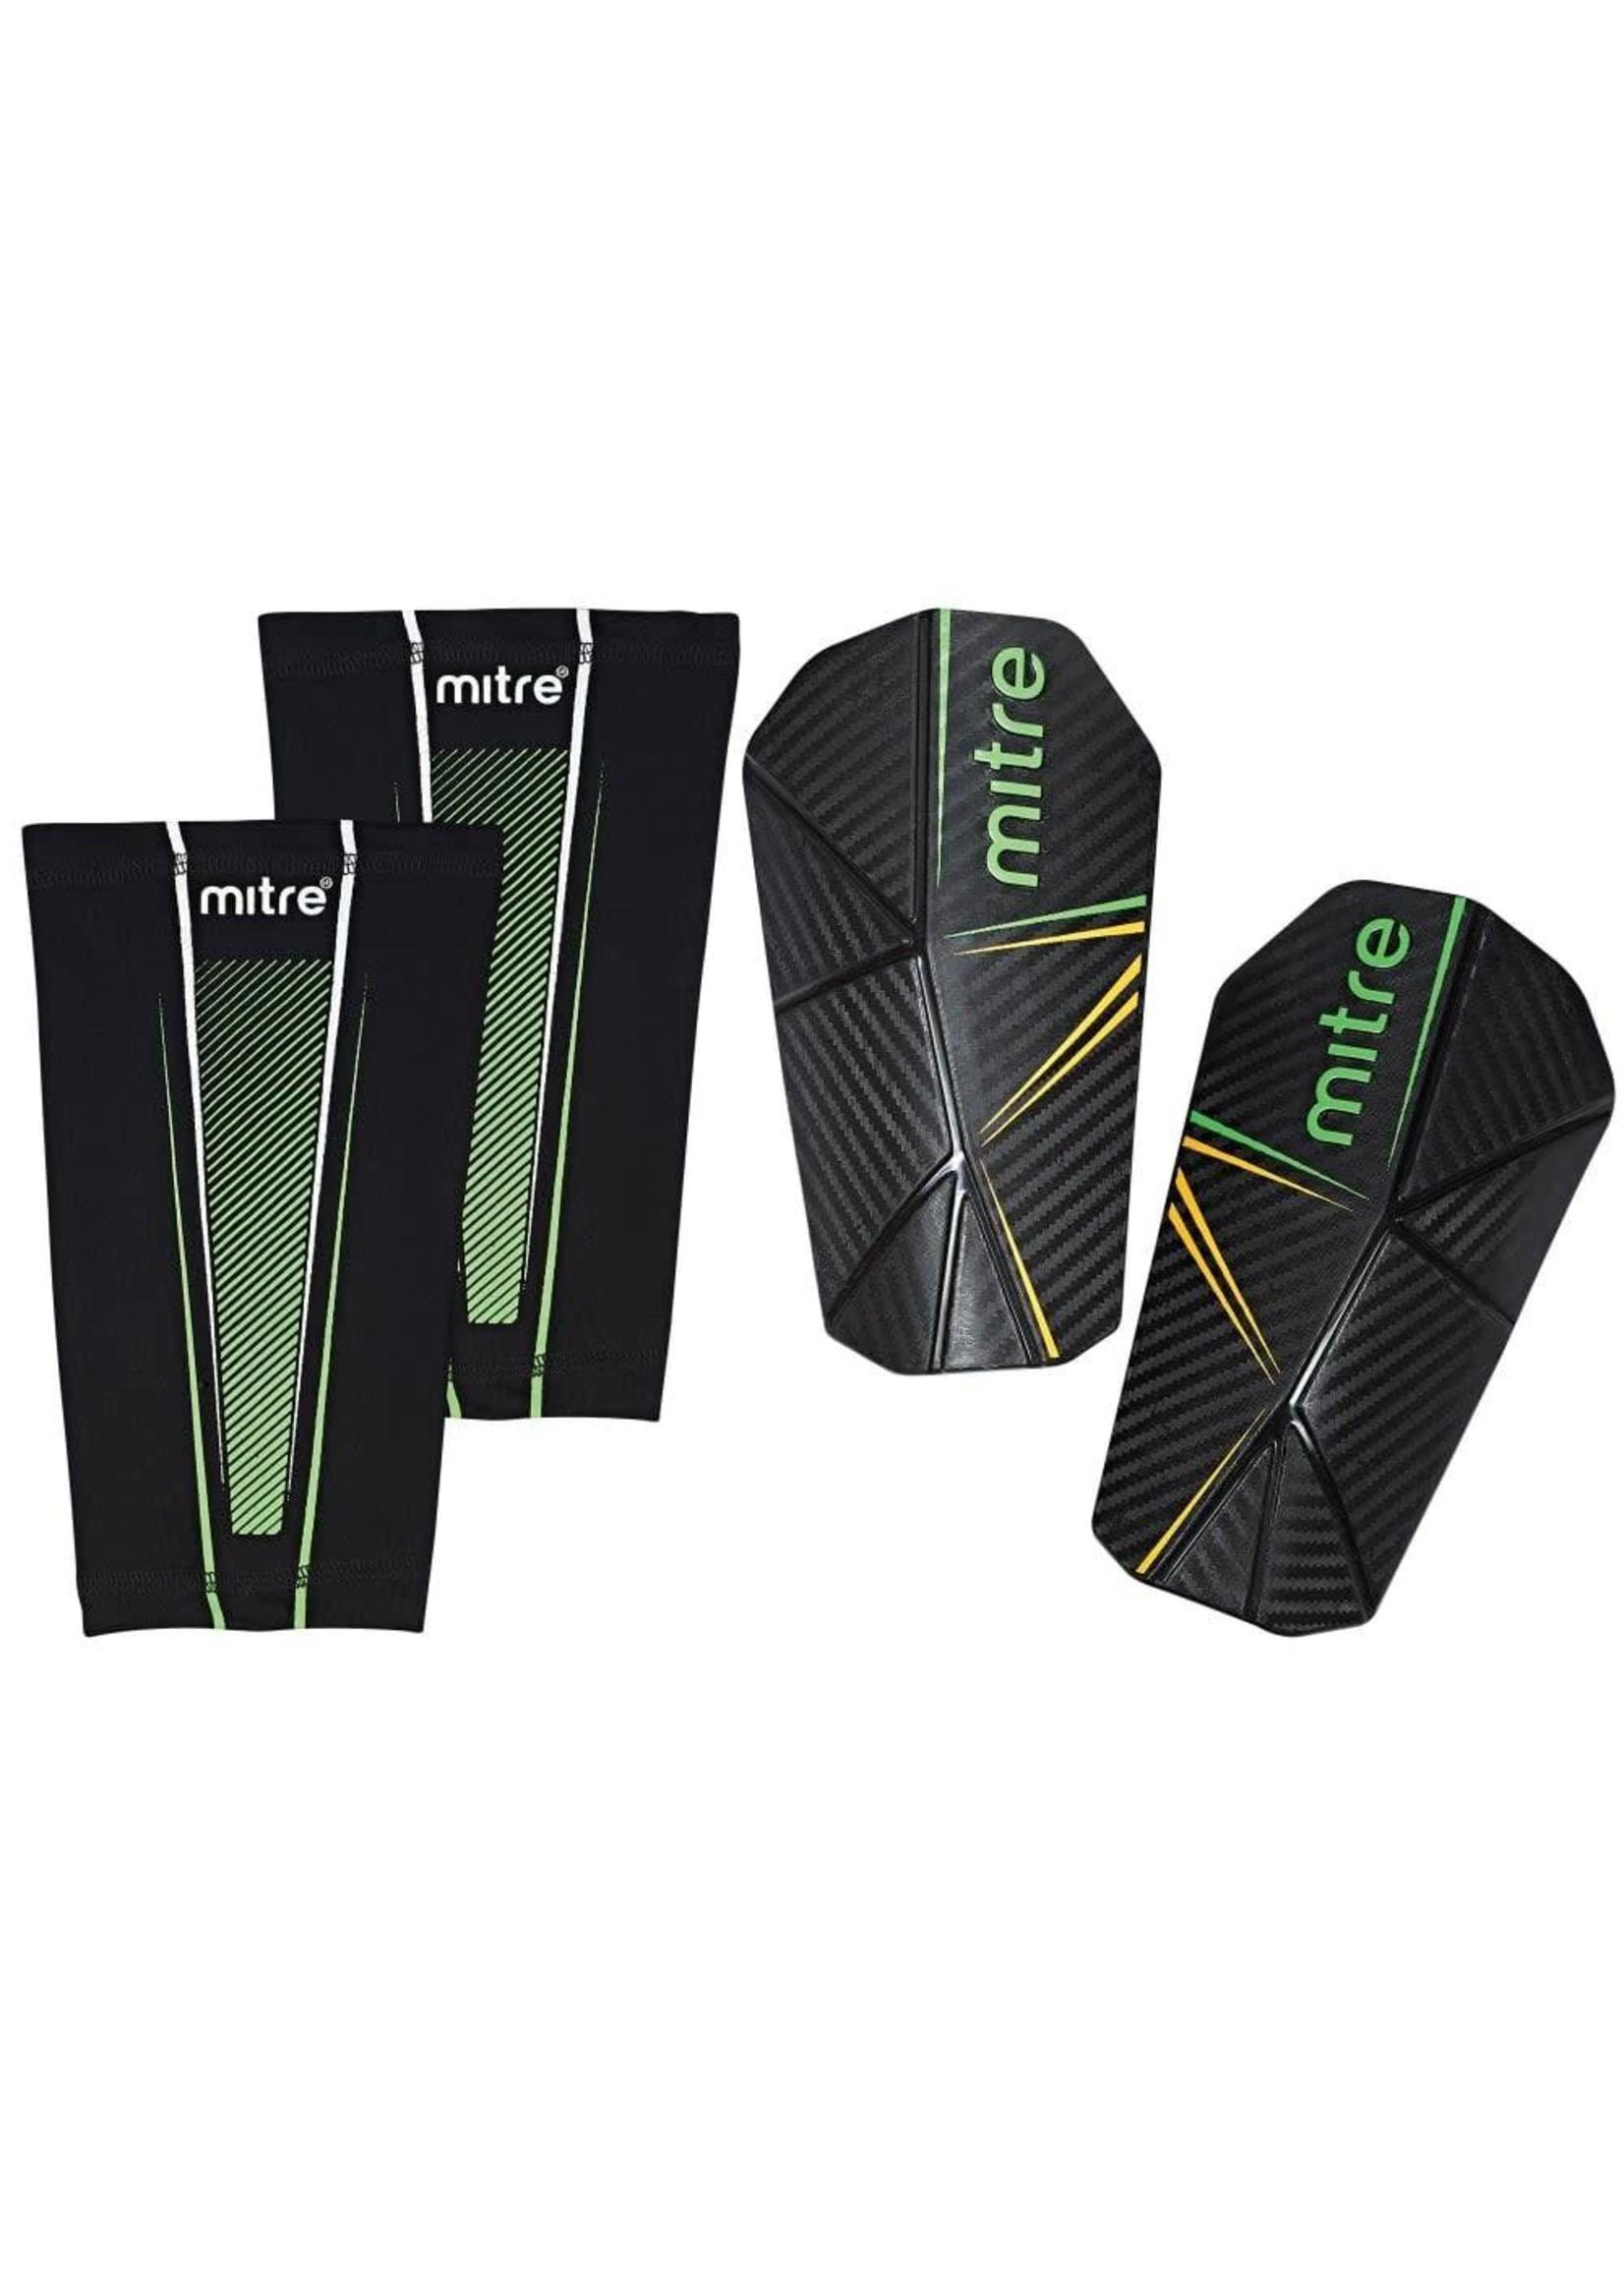 mitre Mitre Slip-In Shinguards, Black/Green/Yellow